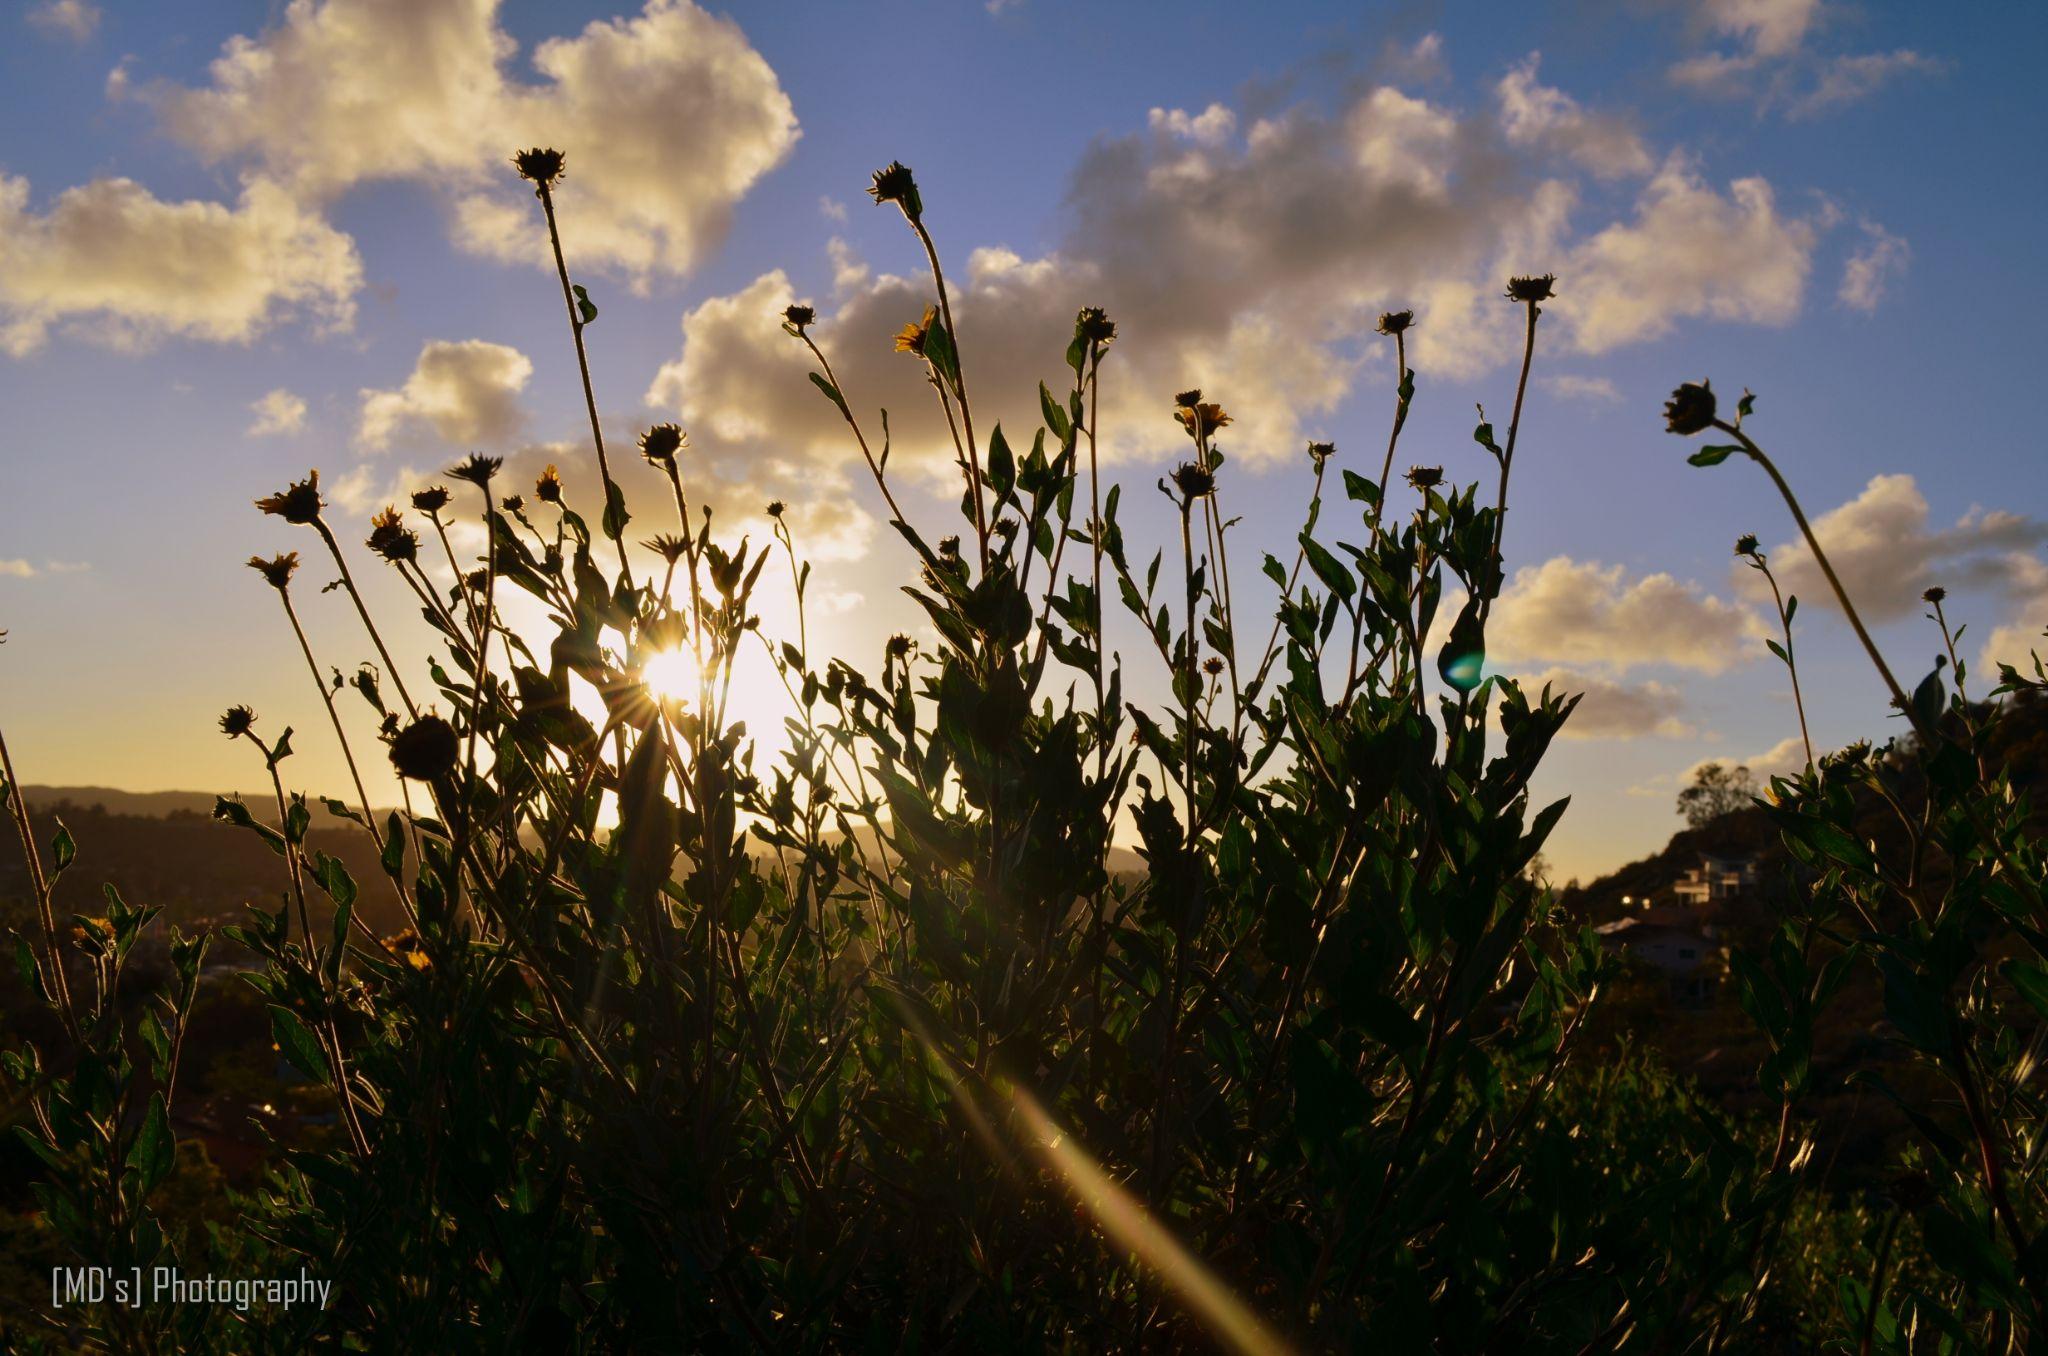 Flower Silhouette by Mohandoss Sampath